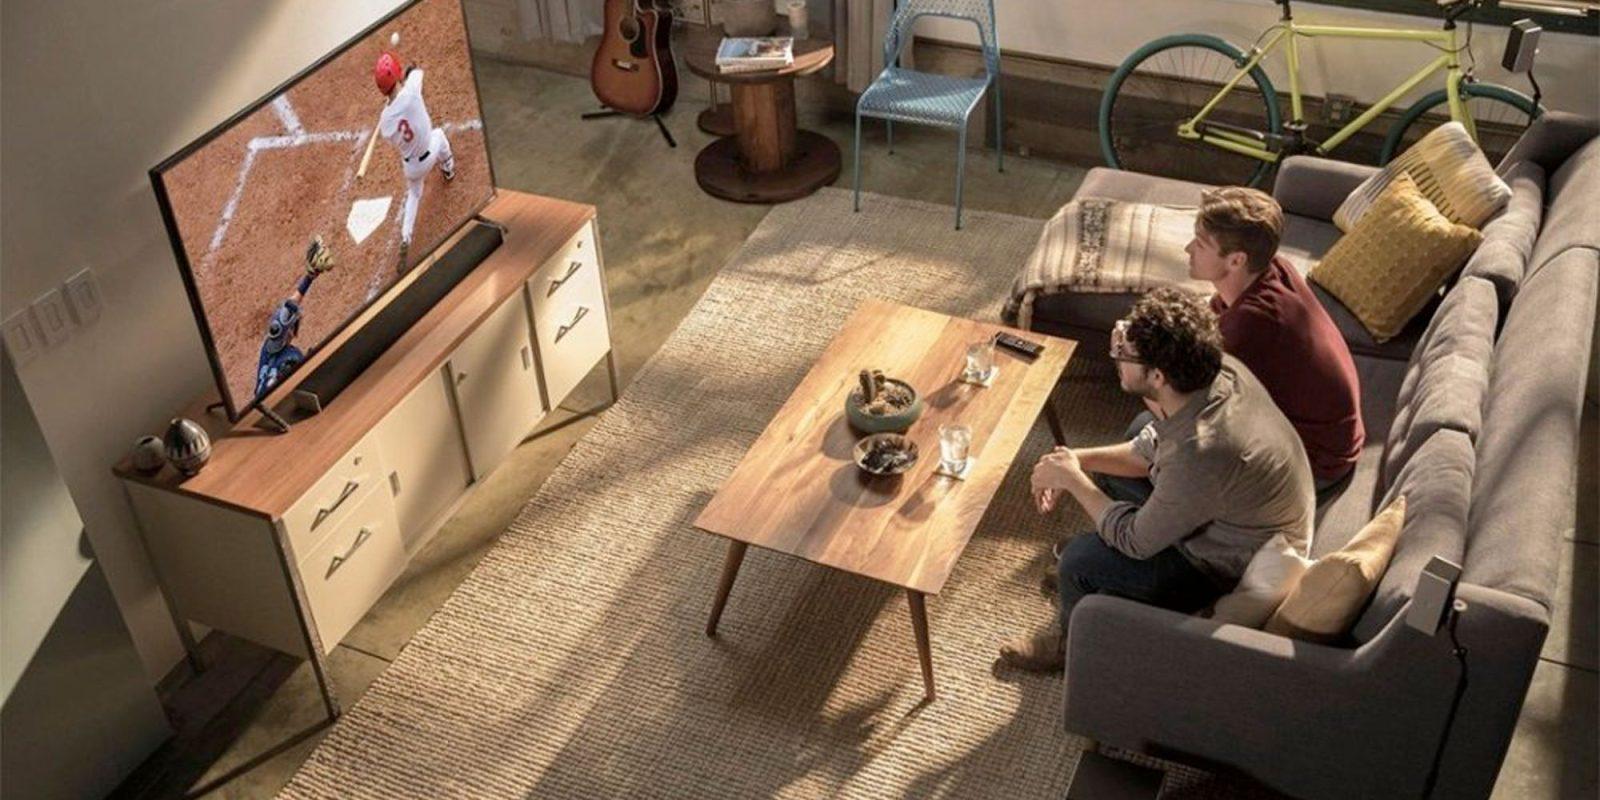 VIZIO's 5.1-Channel Sound Bar has SmartCast & more: $120 (Refurb, Orig. $250)